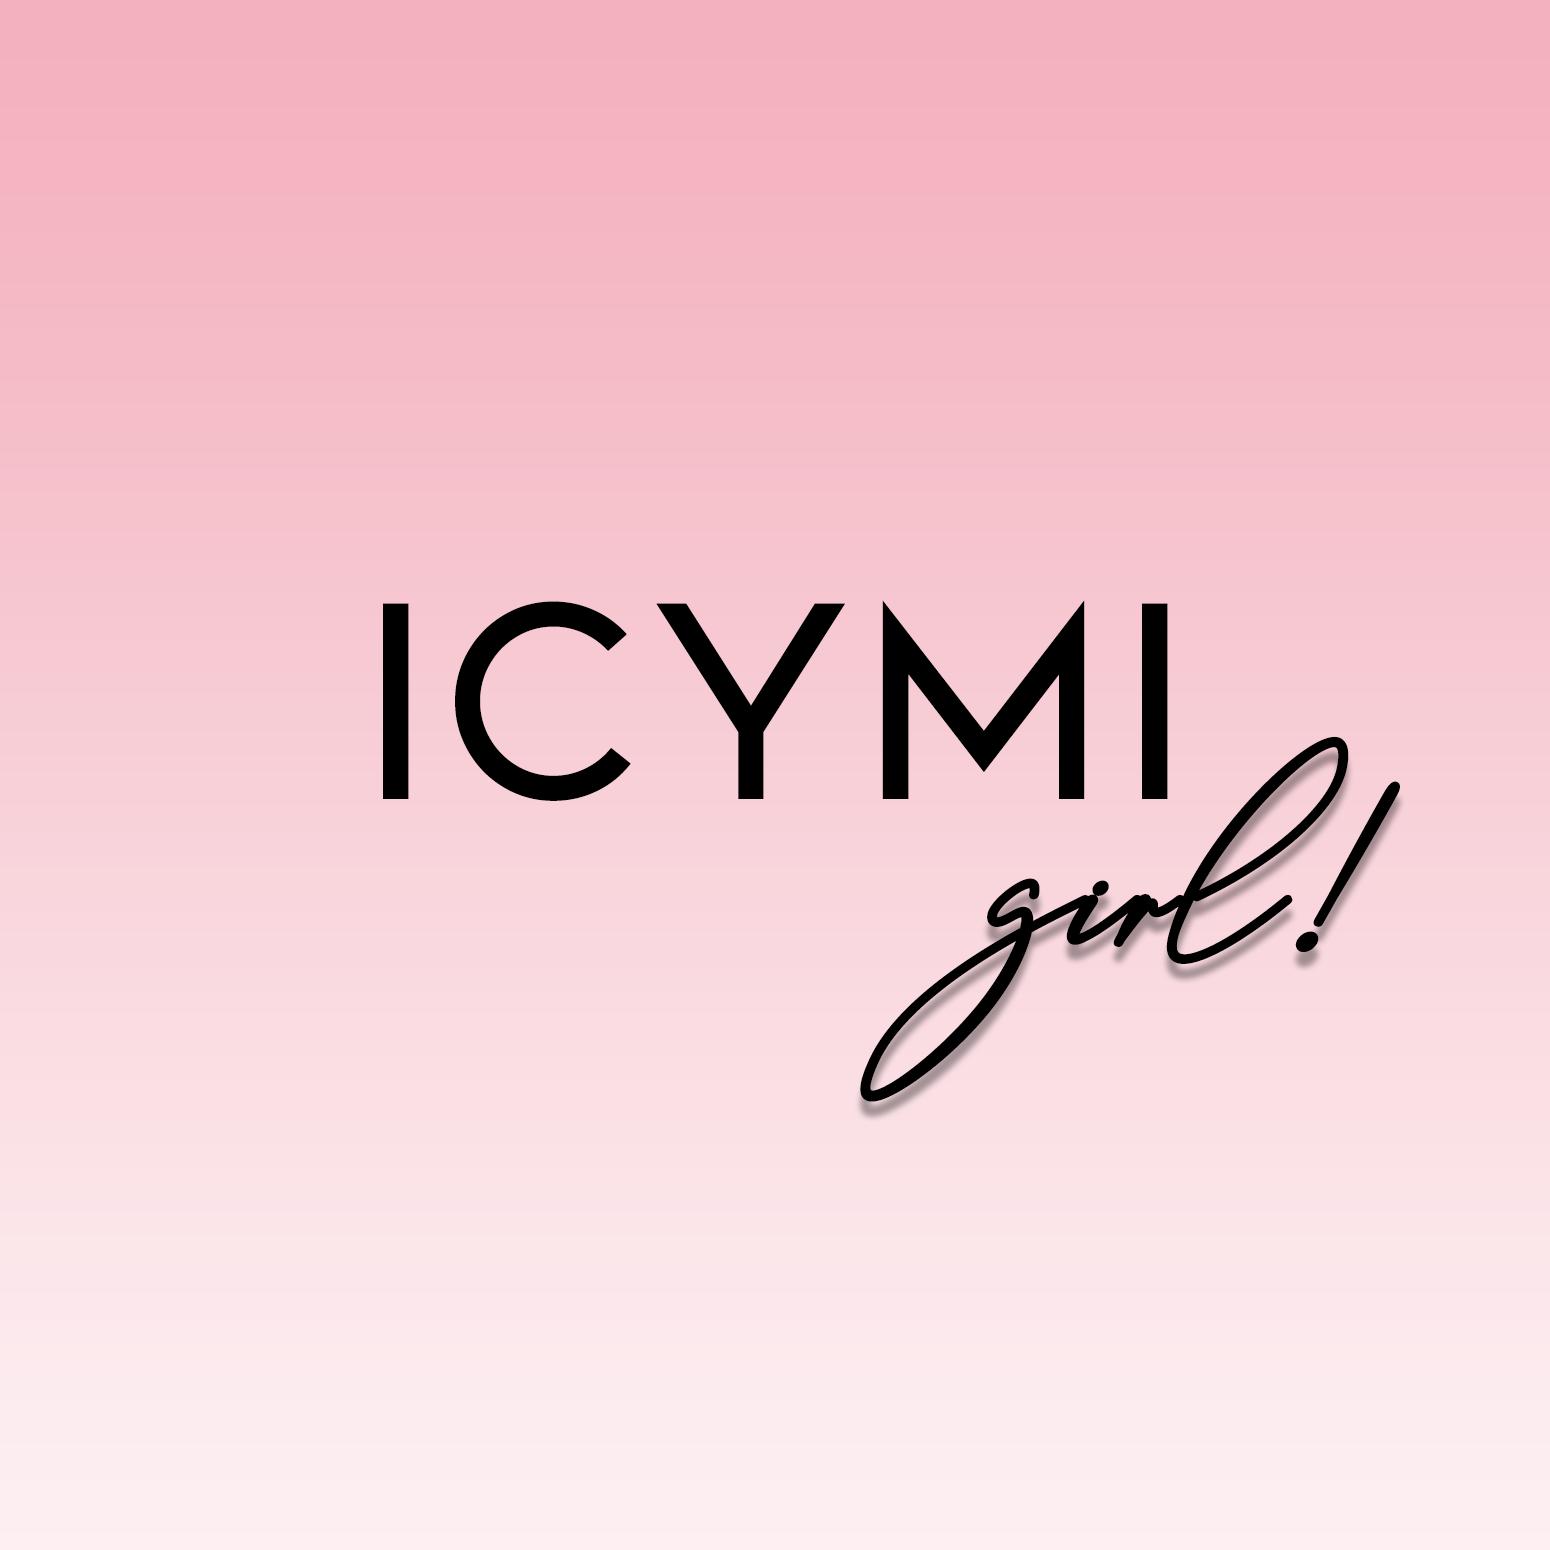 icymigirl.com